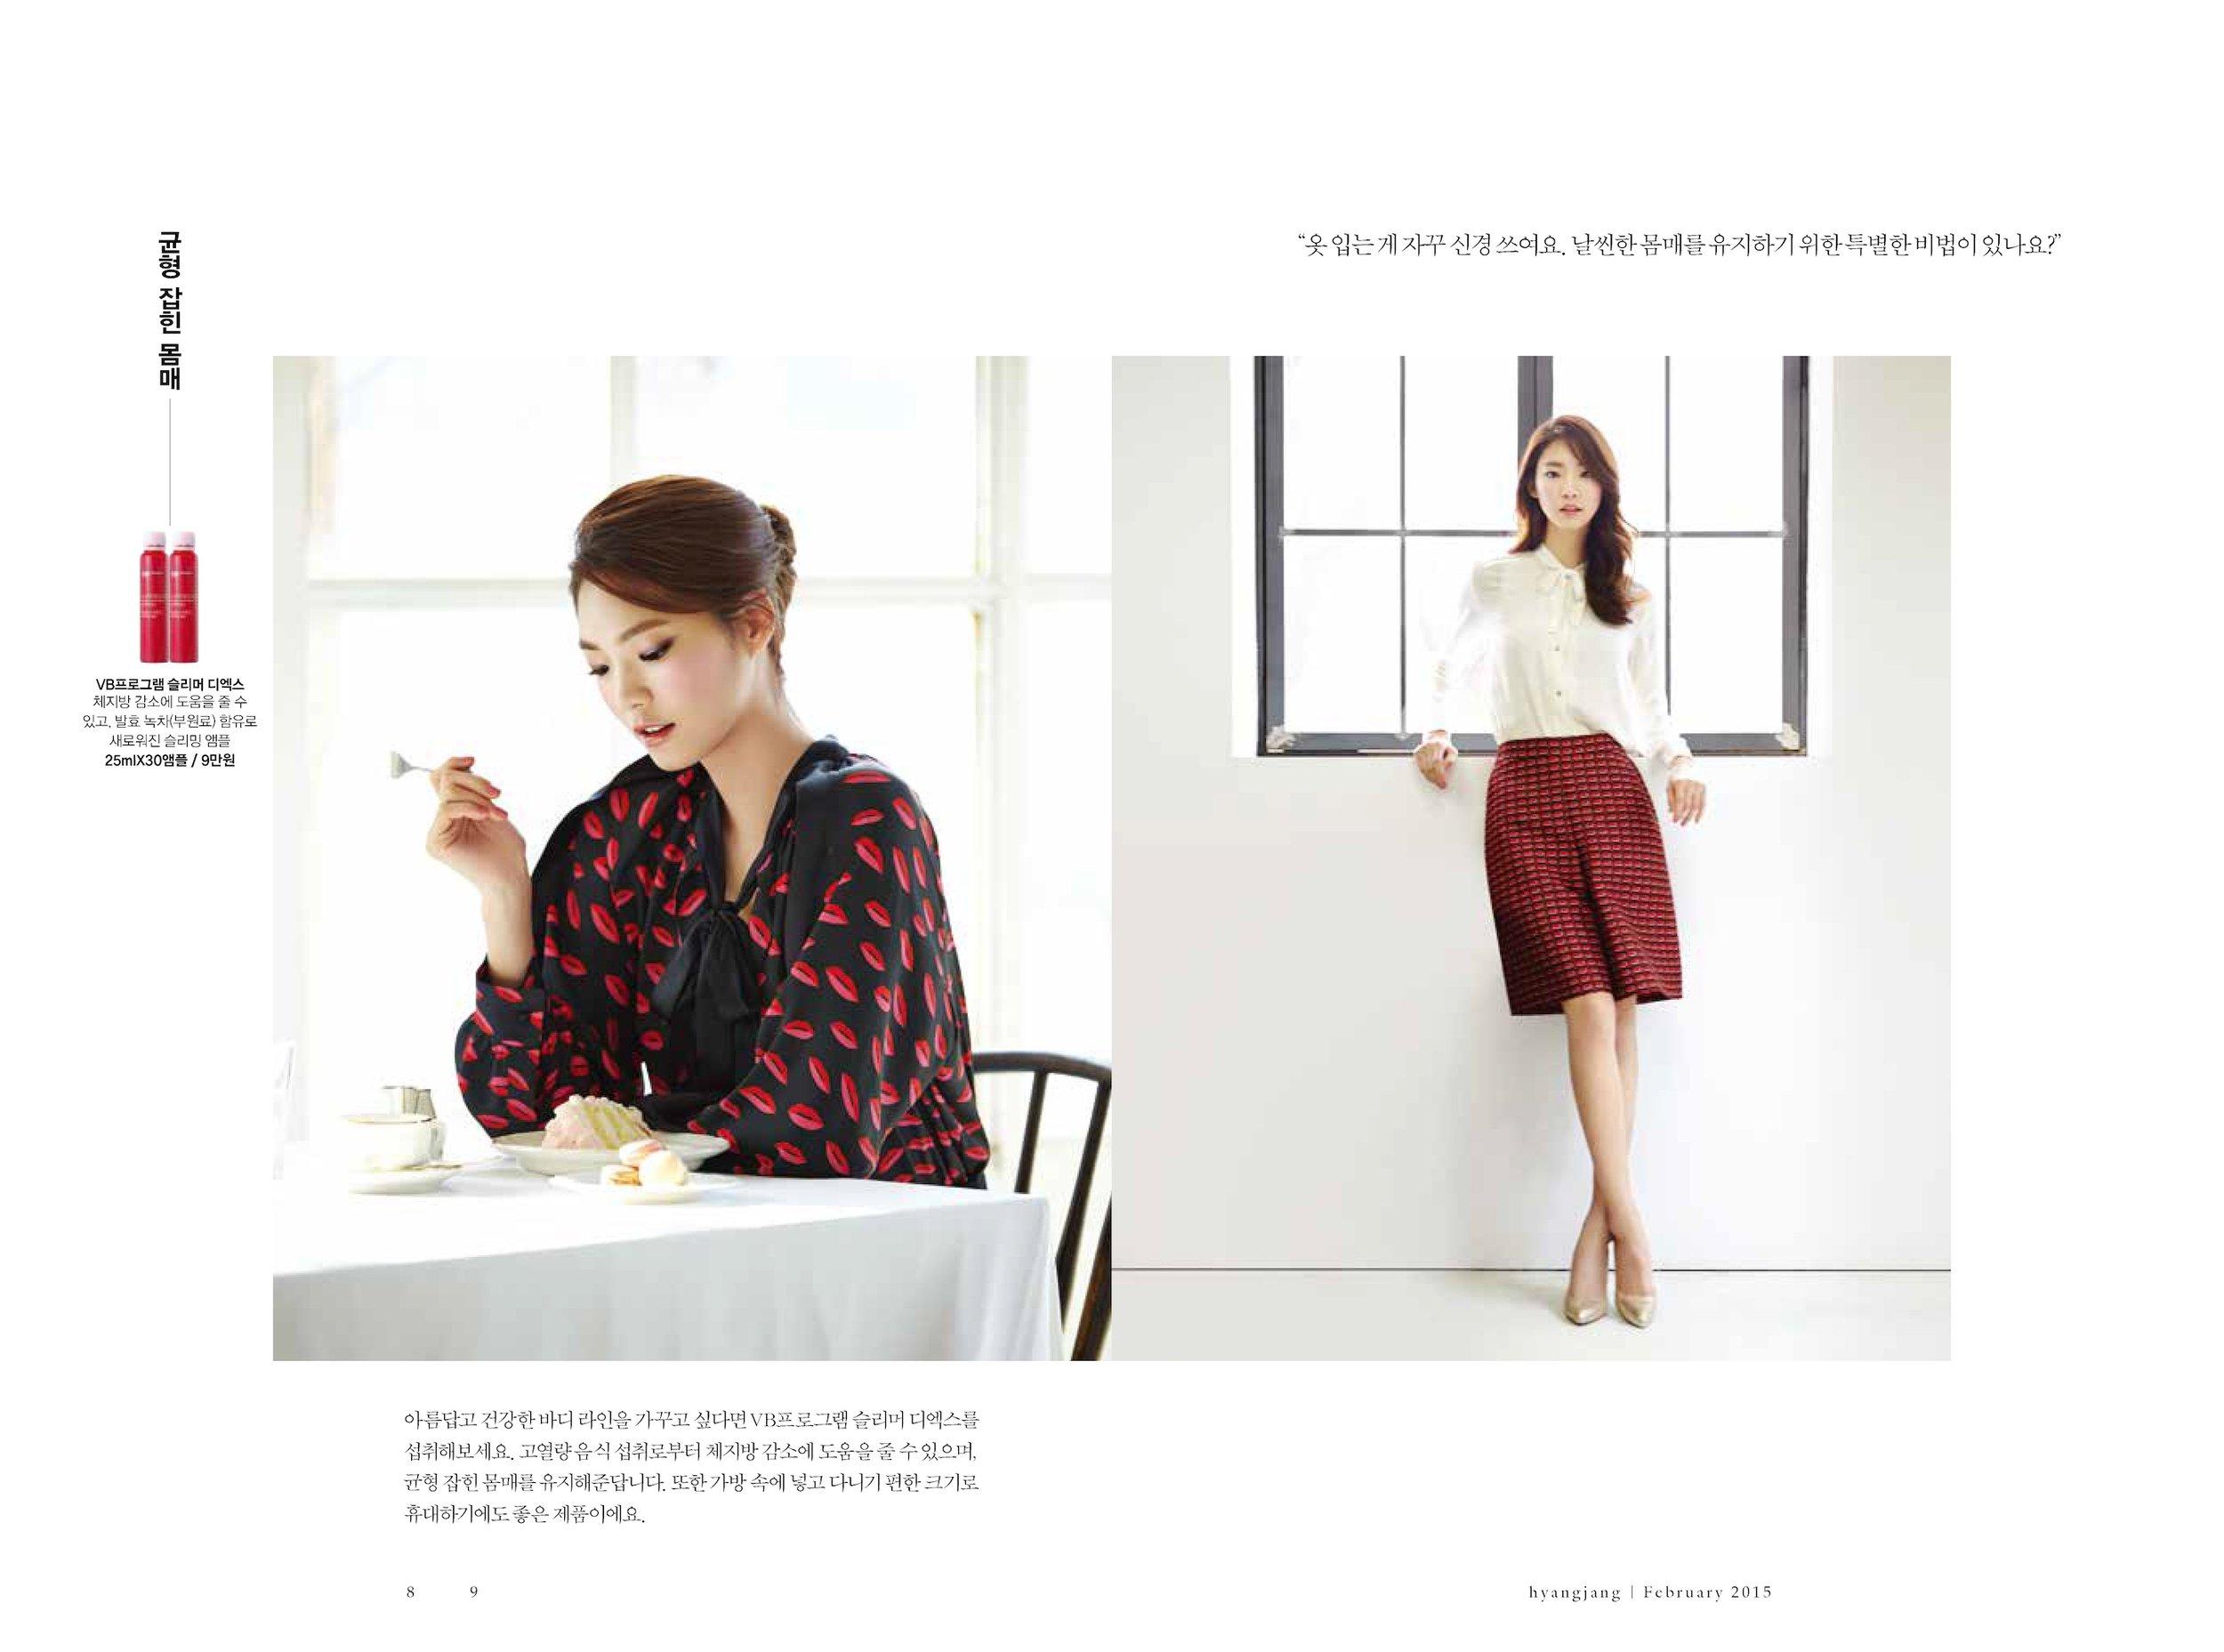 hyangjang-201502_페이지_05.jpeg